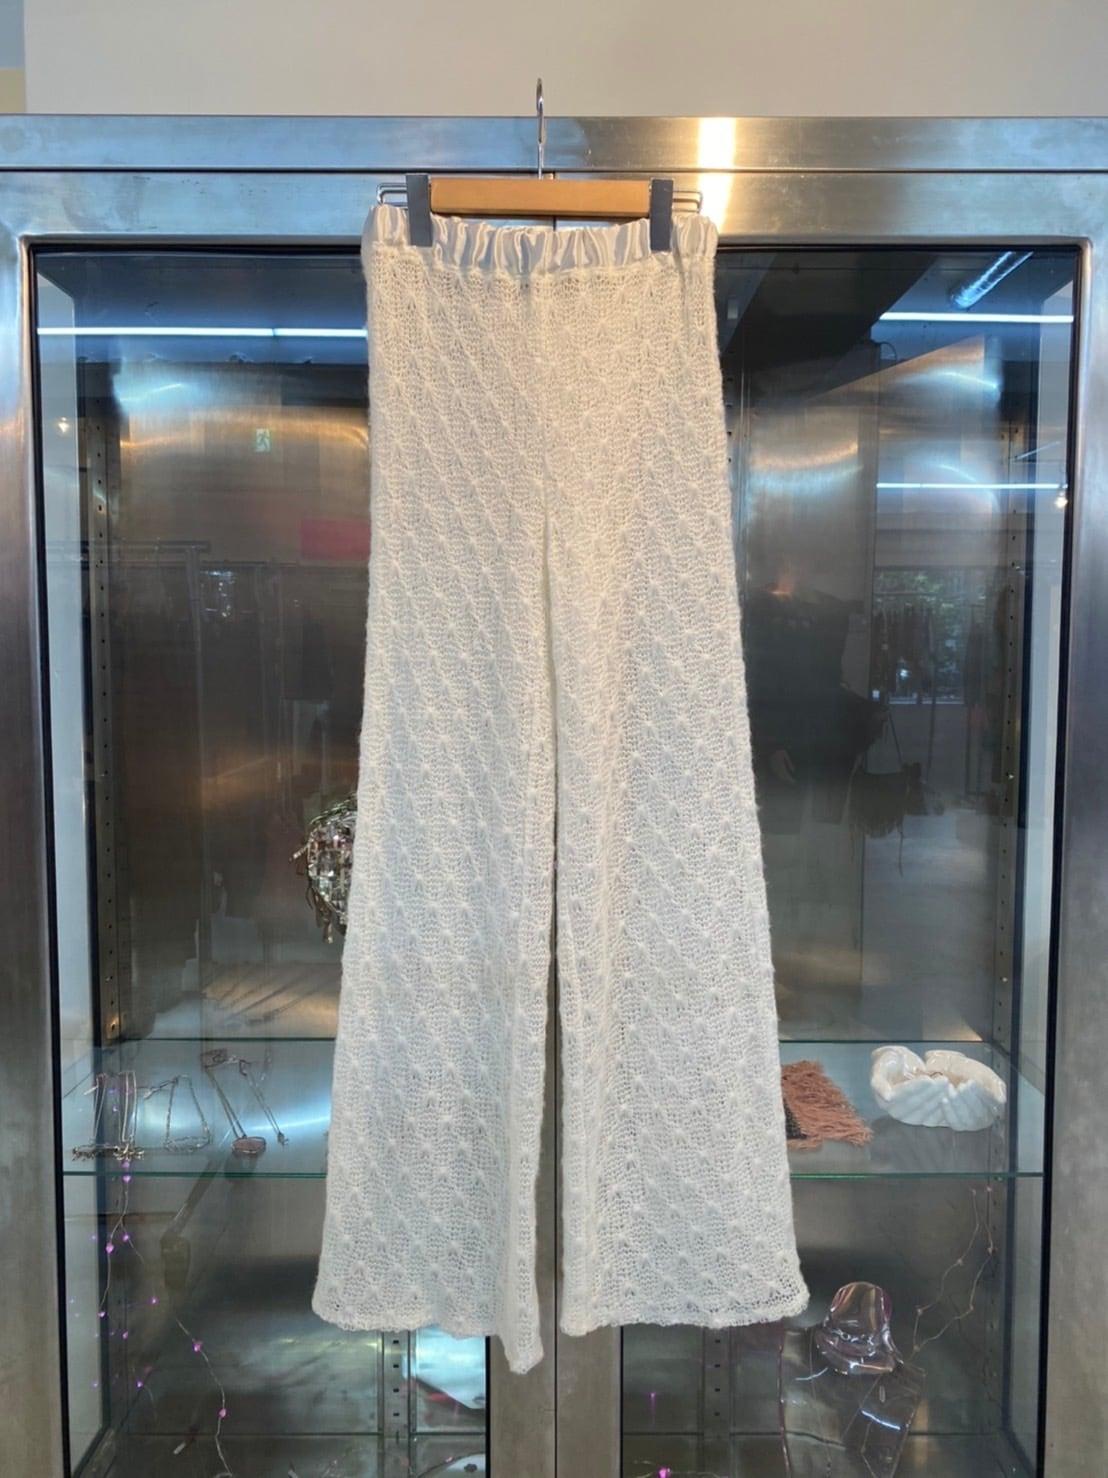 New knit pants